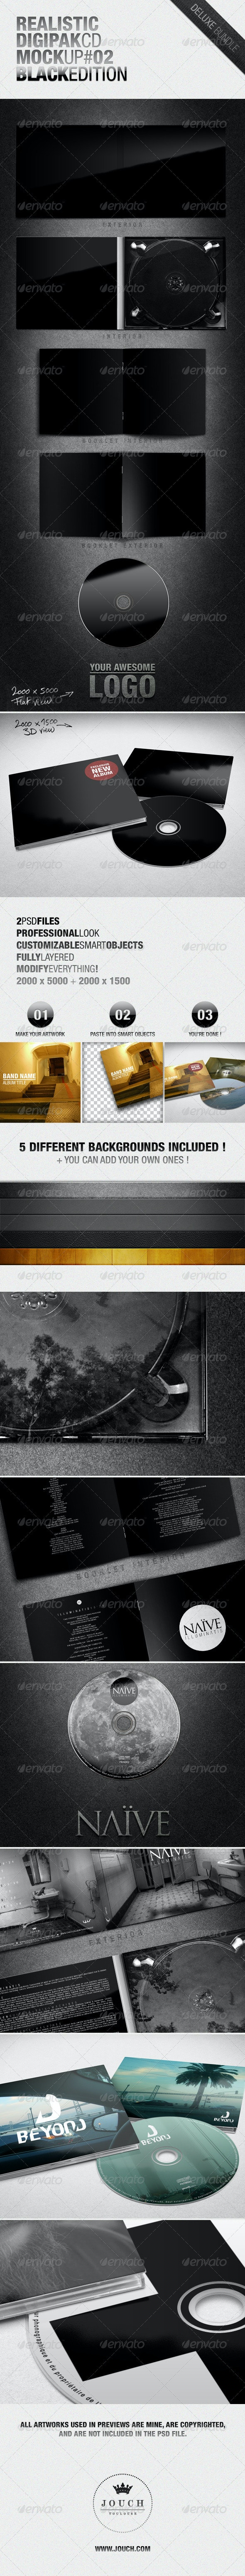 Realistic Digipak CD Mockup #02 Black Edition - Miscellaneous Product Mock-Ups